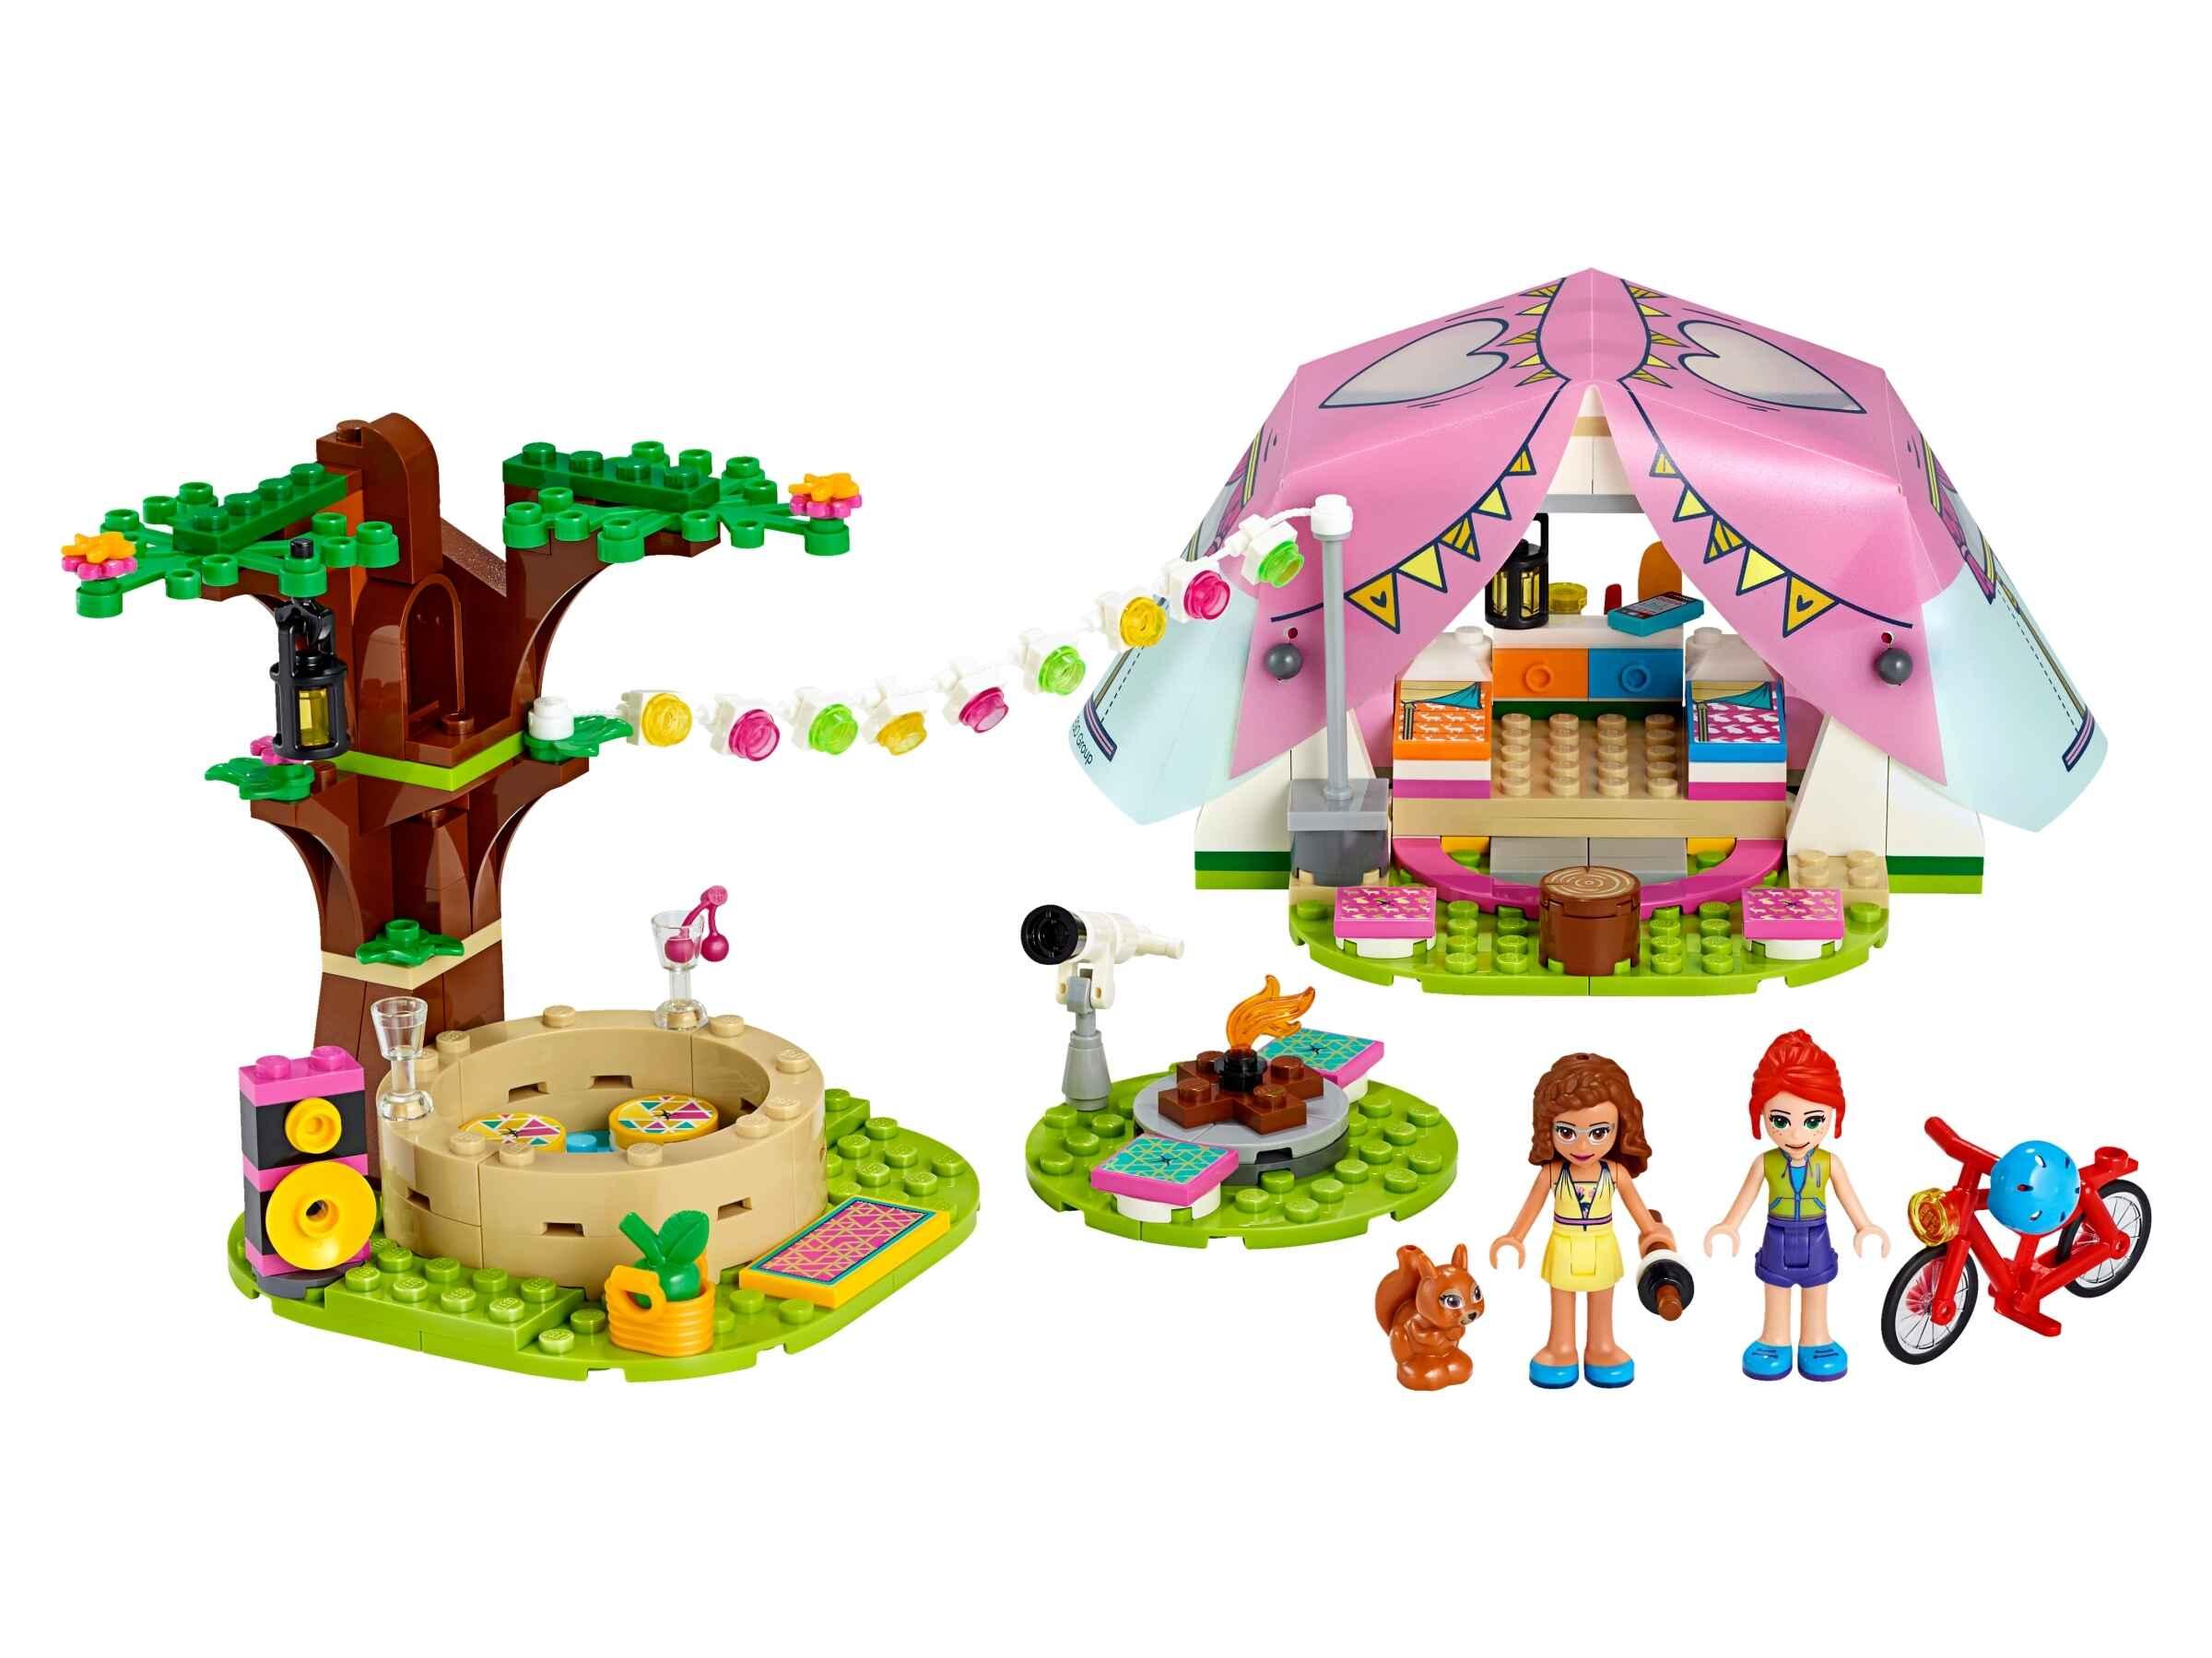 LEGO 41392 Friends Camping in Heartlake City Set, mit Figuren Olivia & Mia, Zelt